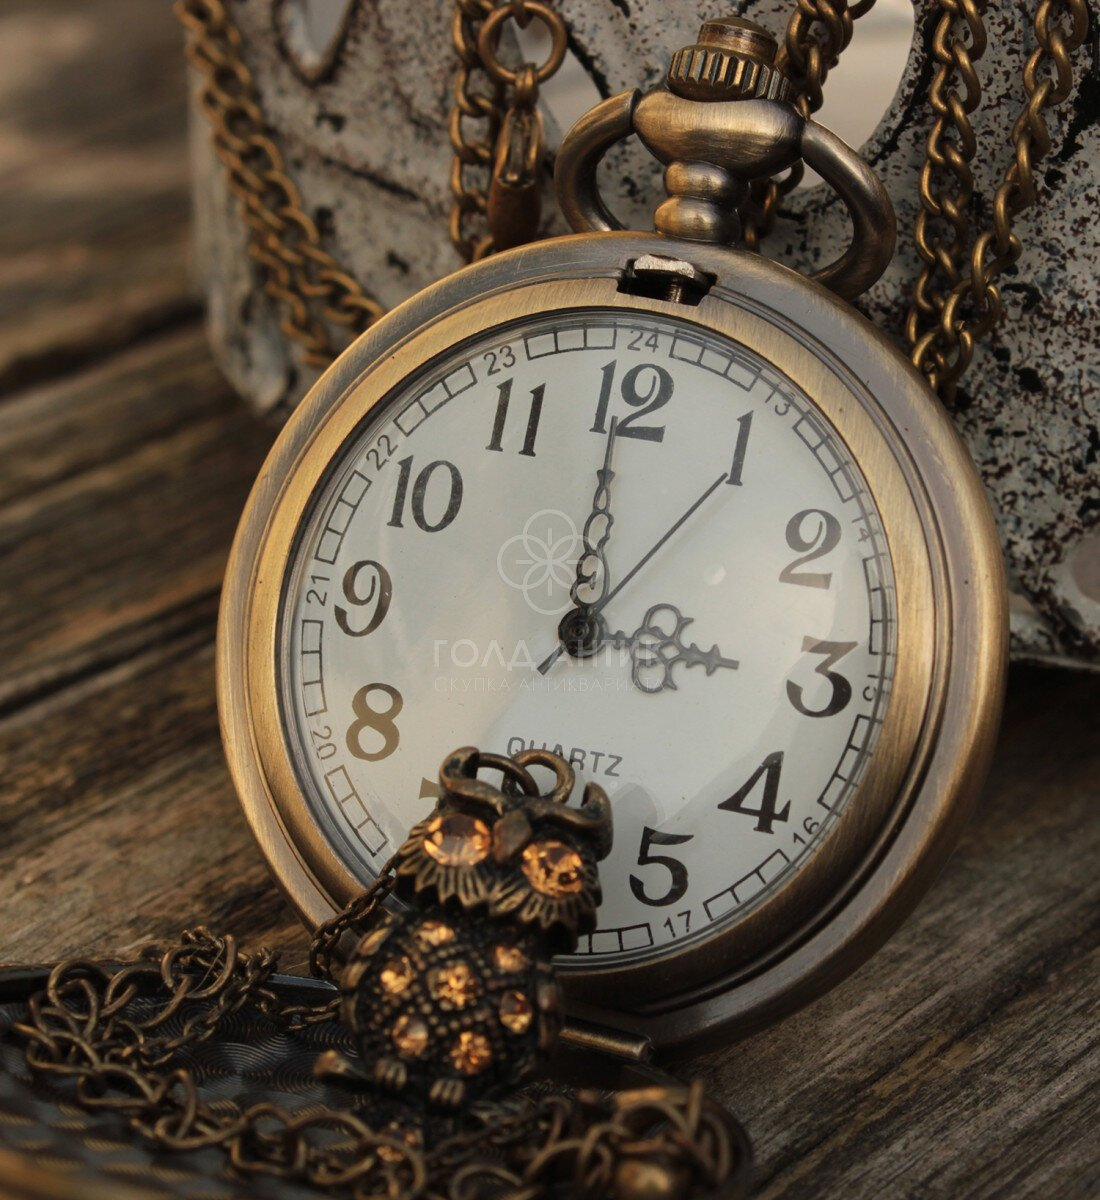 Оценка часы онлайн часов ломбарды элитных